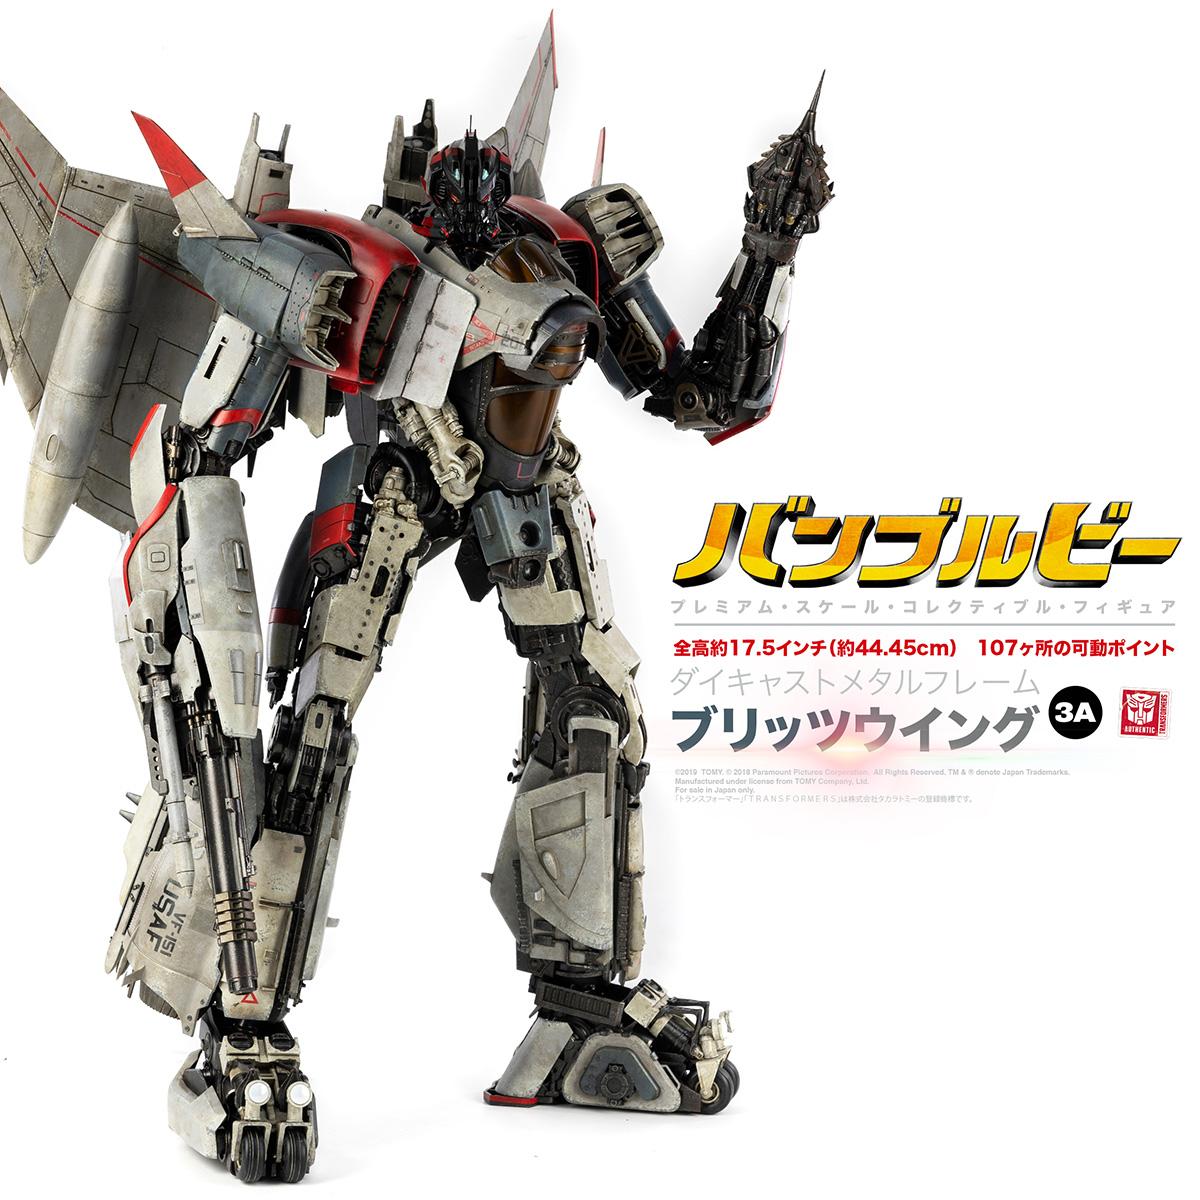 Blitzwing_PM_JAP_1007.jpg